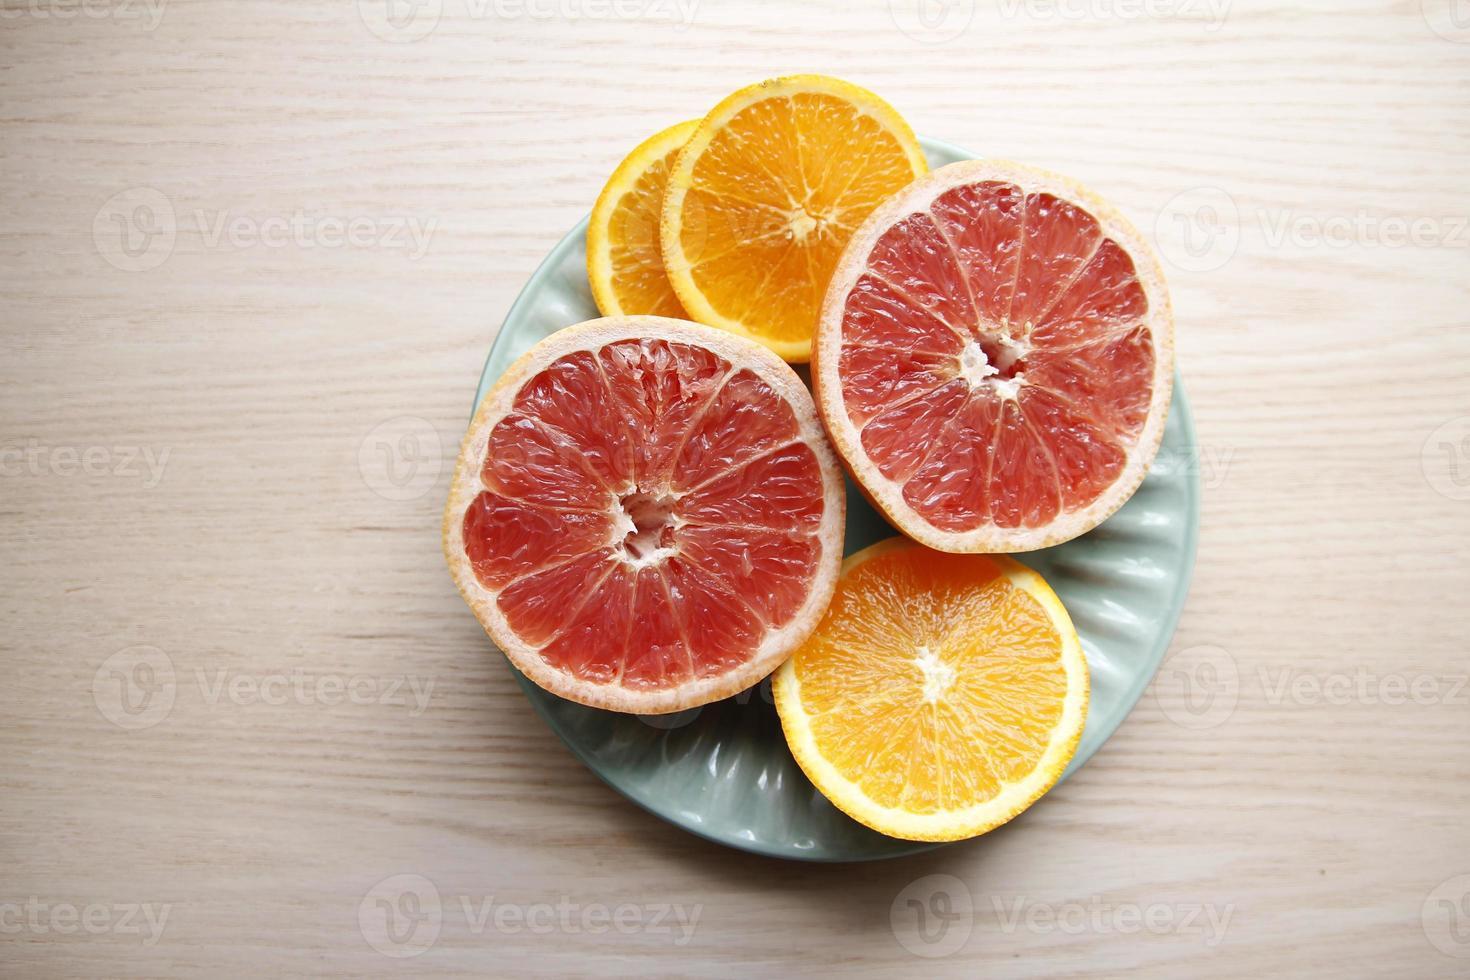 Grapefruit and Orange Slices photo